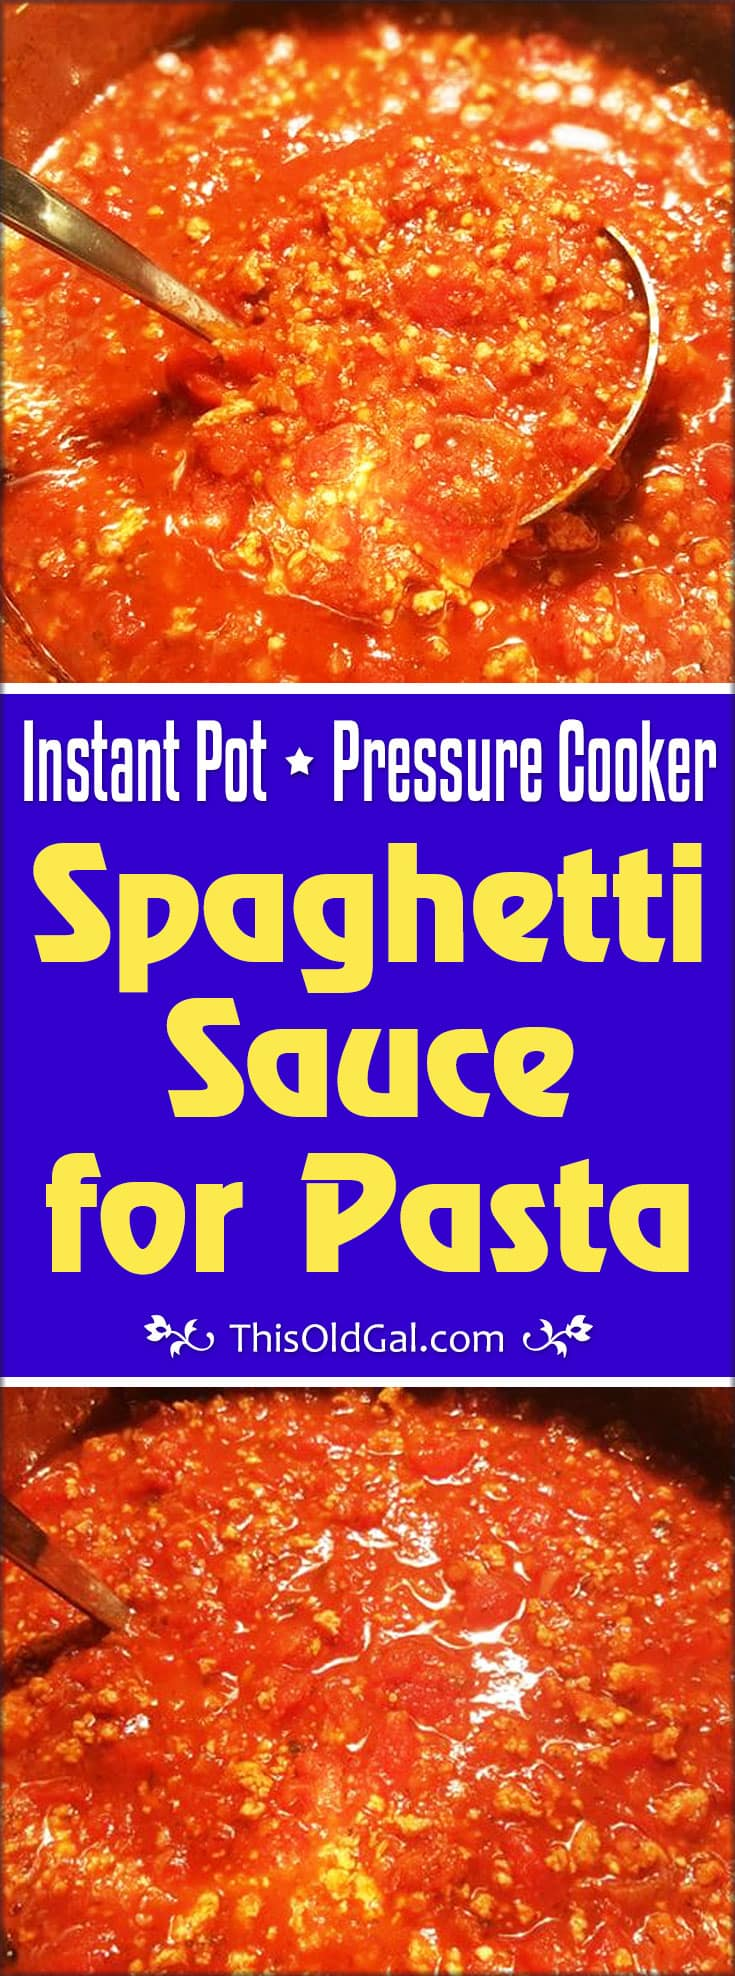 Instant Pot Pressure Cooker Spaghetti Sauce for Pasta